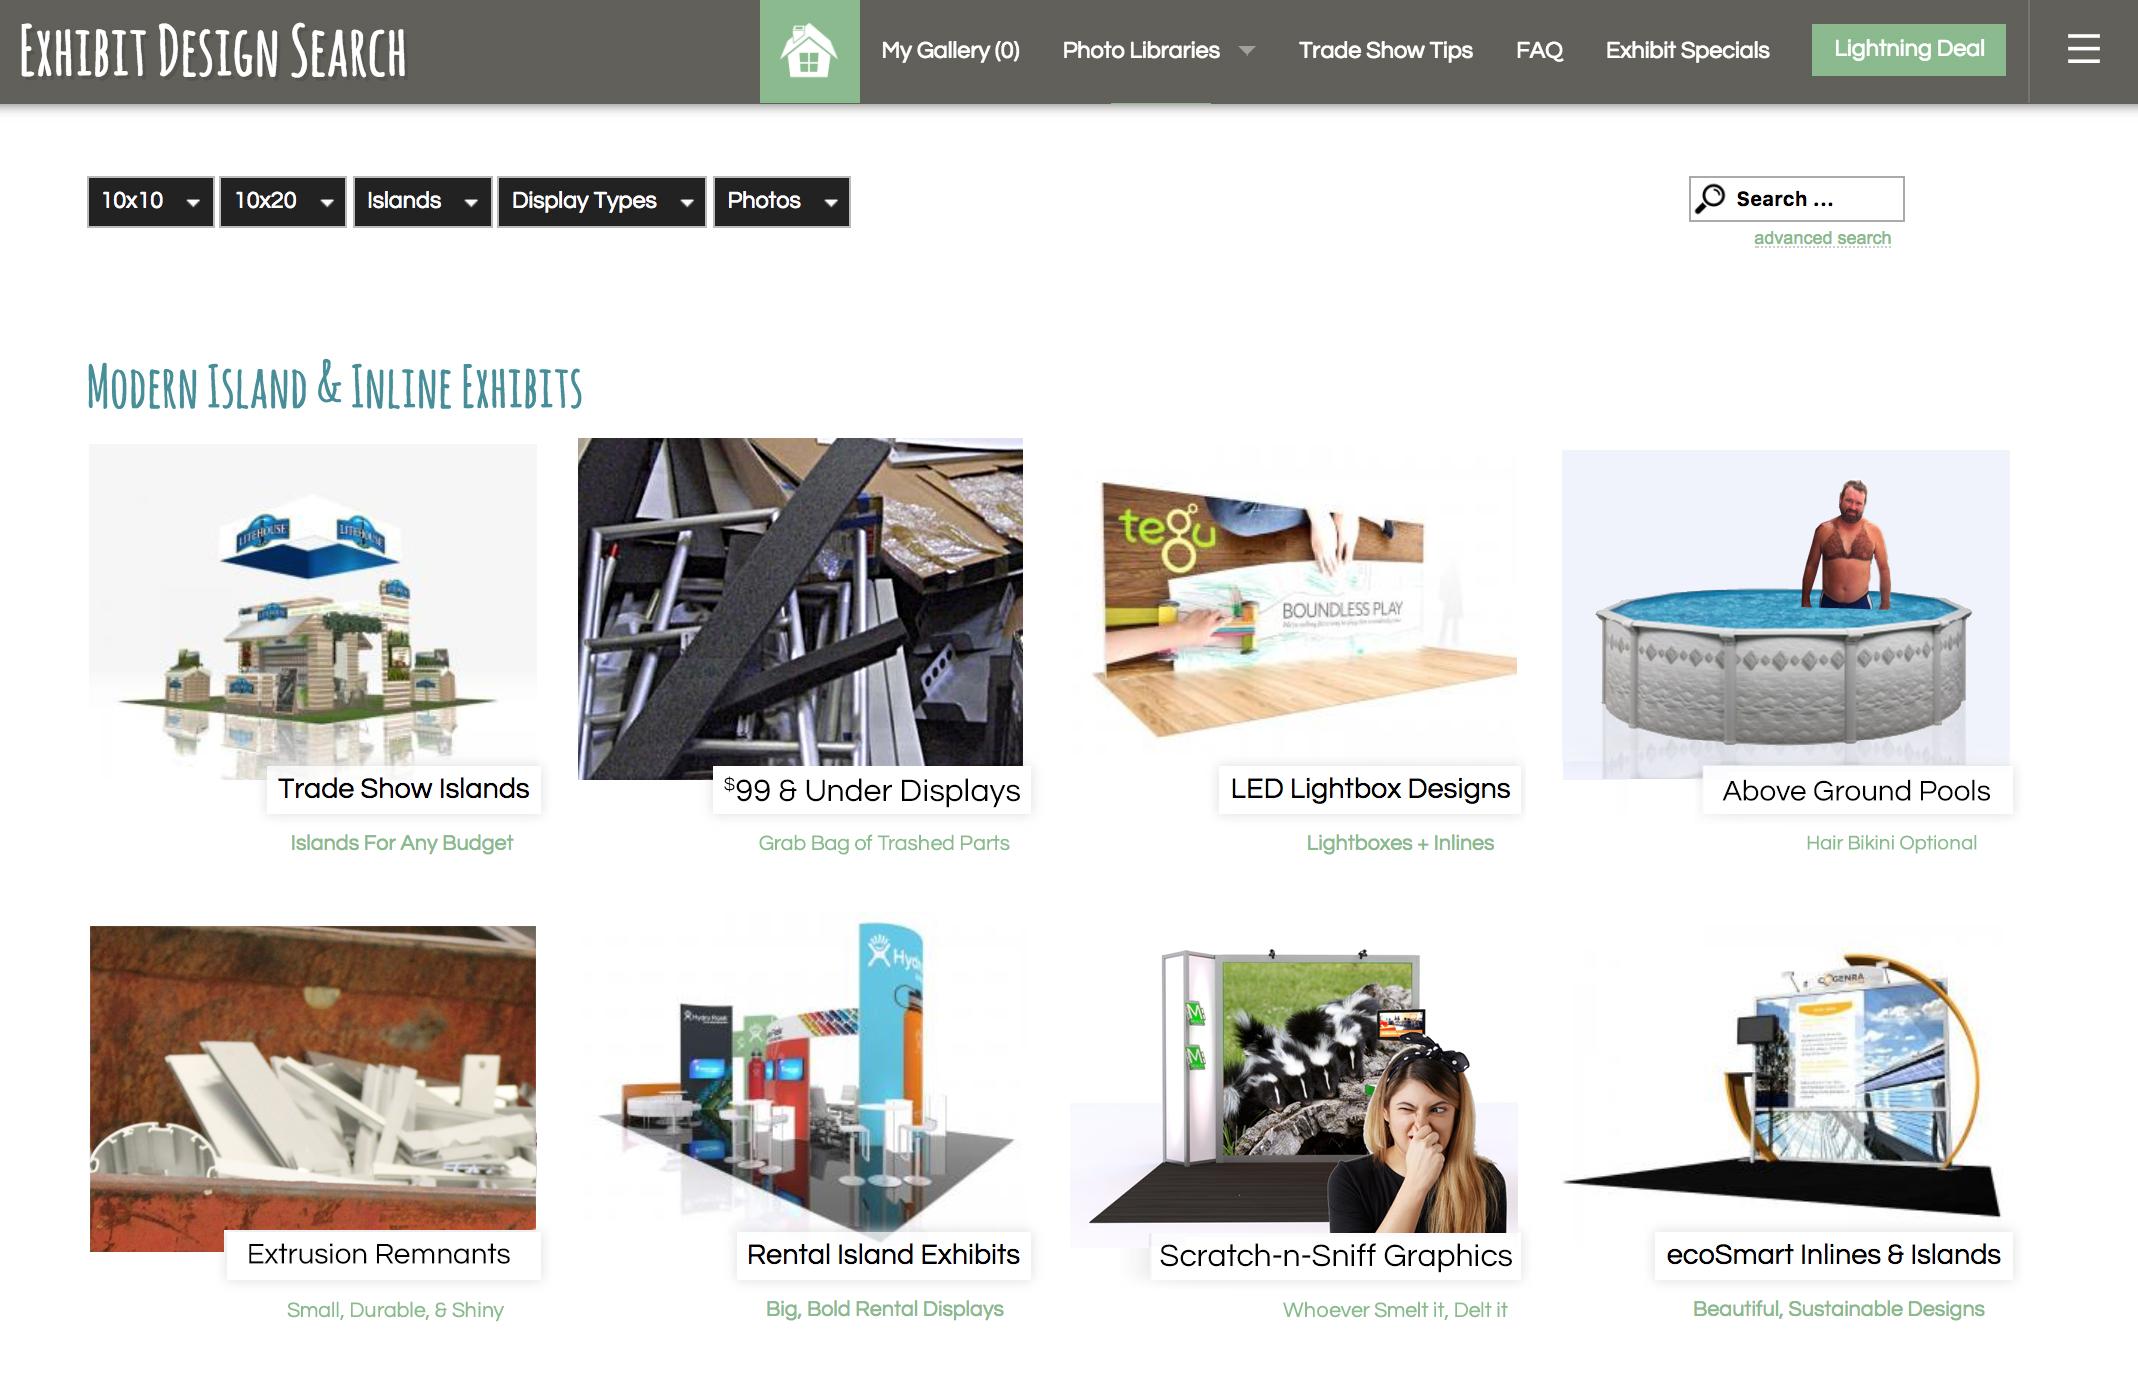 DesignSearchRevamp